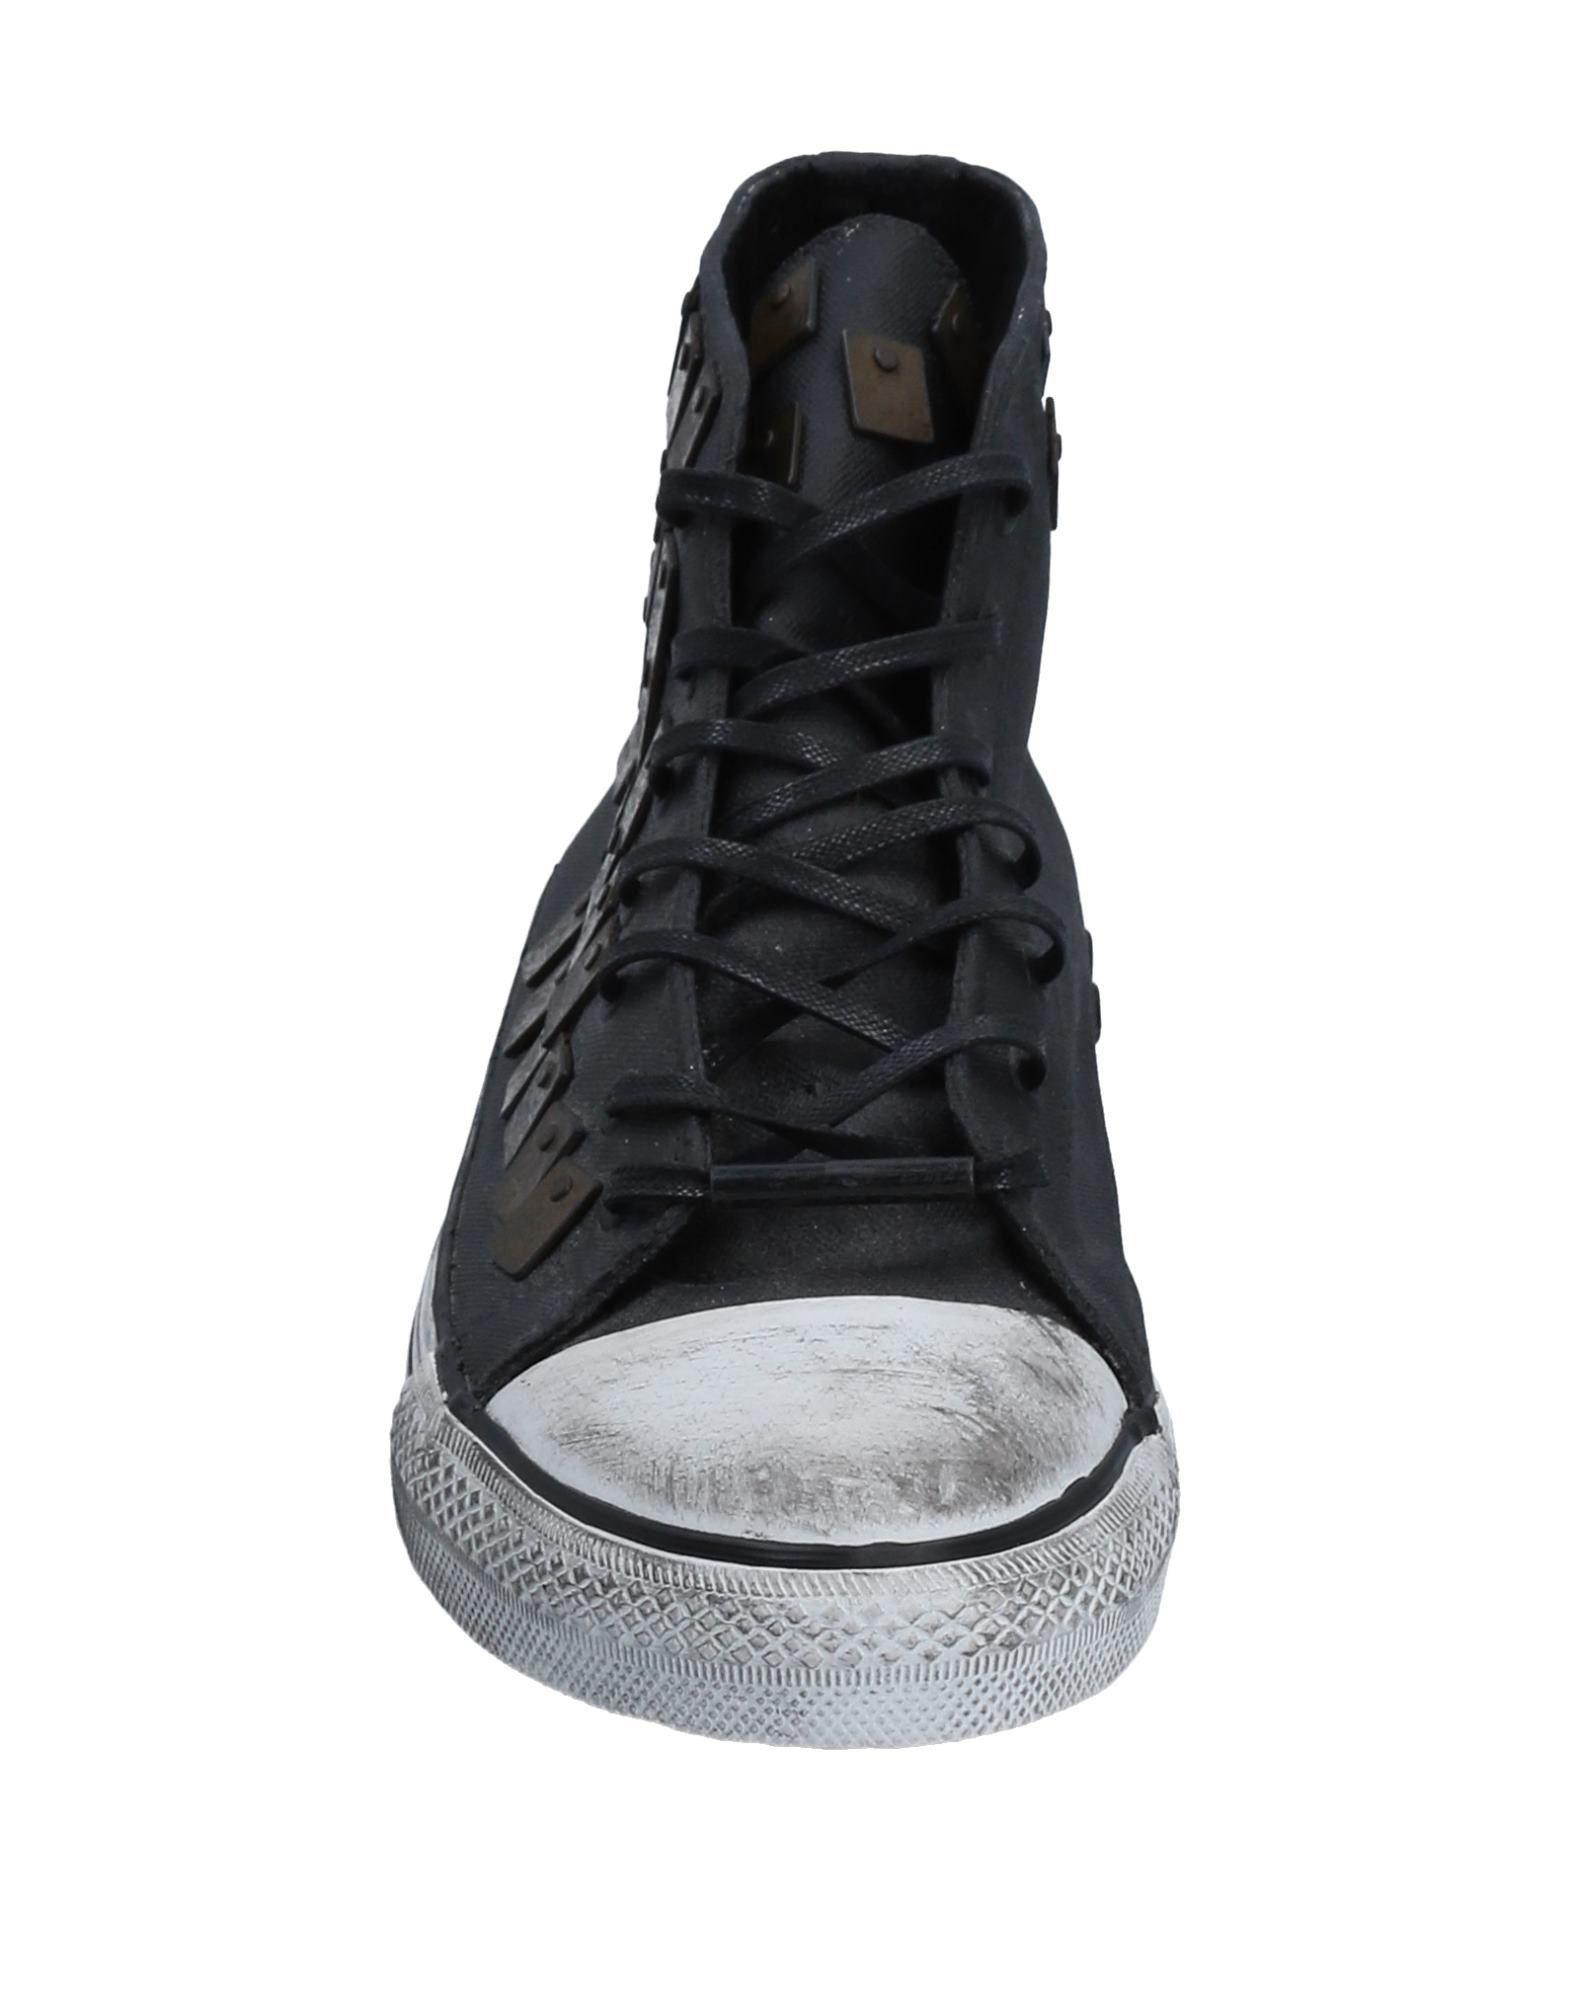 Dioniso Sneakers Herren Preis-Leistungs-Verhältnis, Gutes Preis-Leistungs-Verhältnis, Herren es lohnt sich e4474f